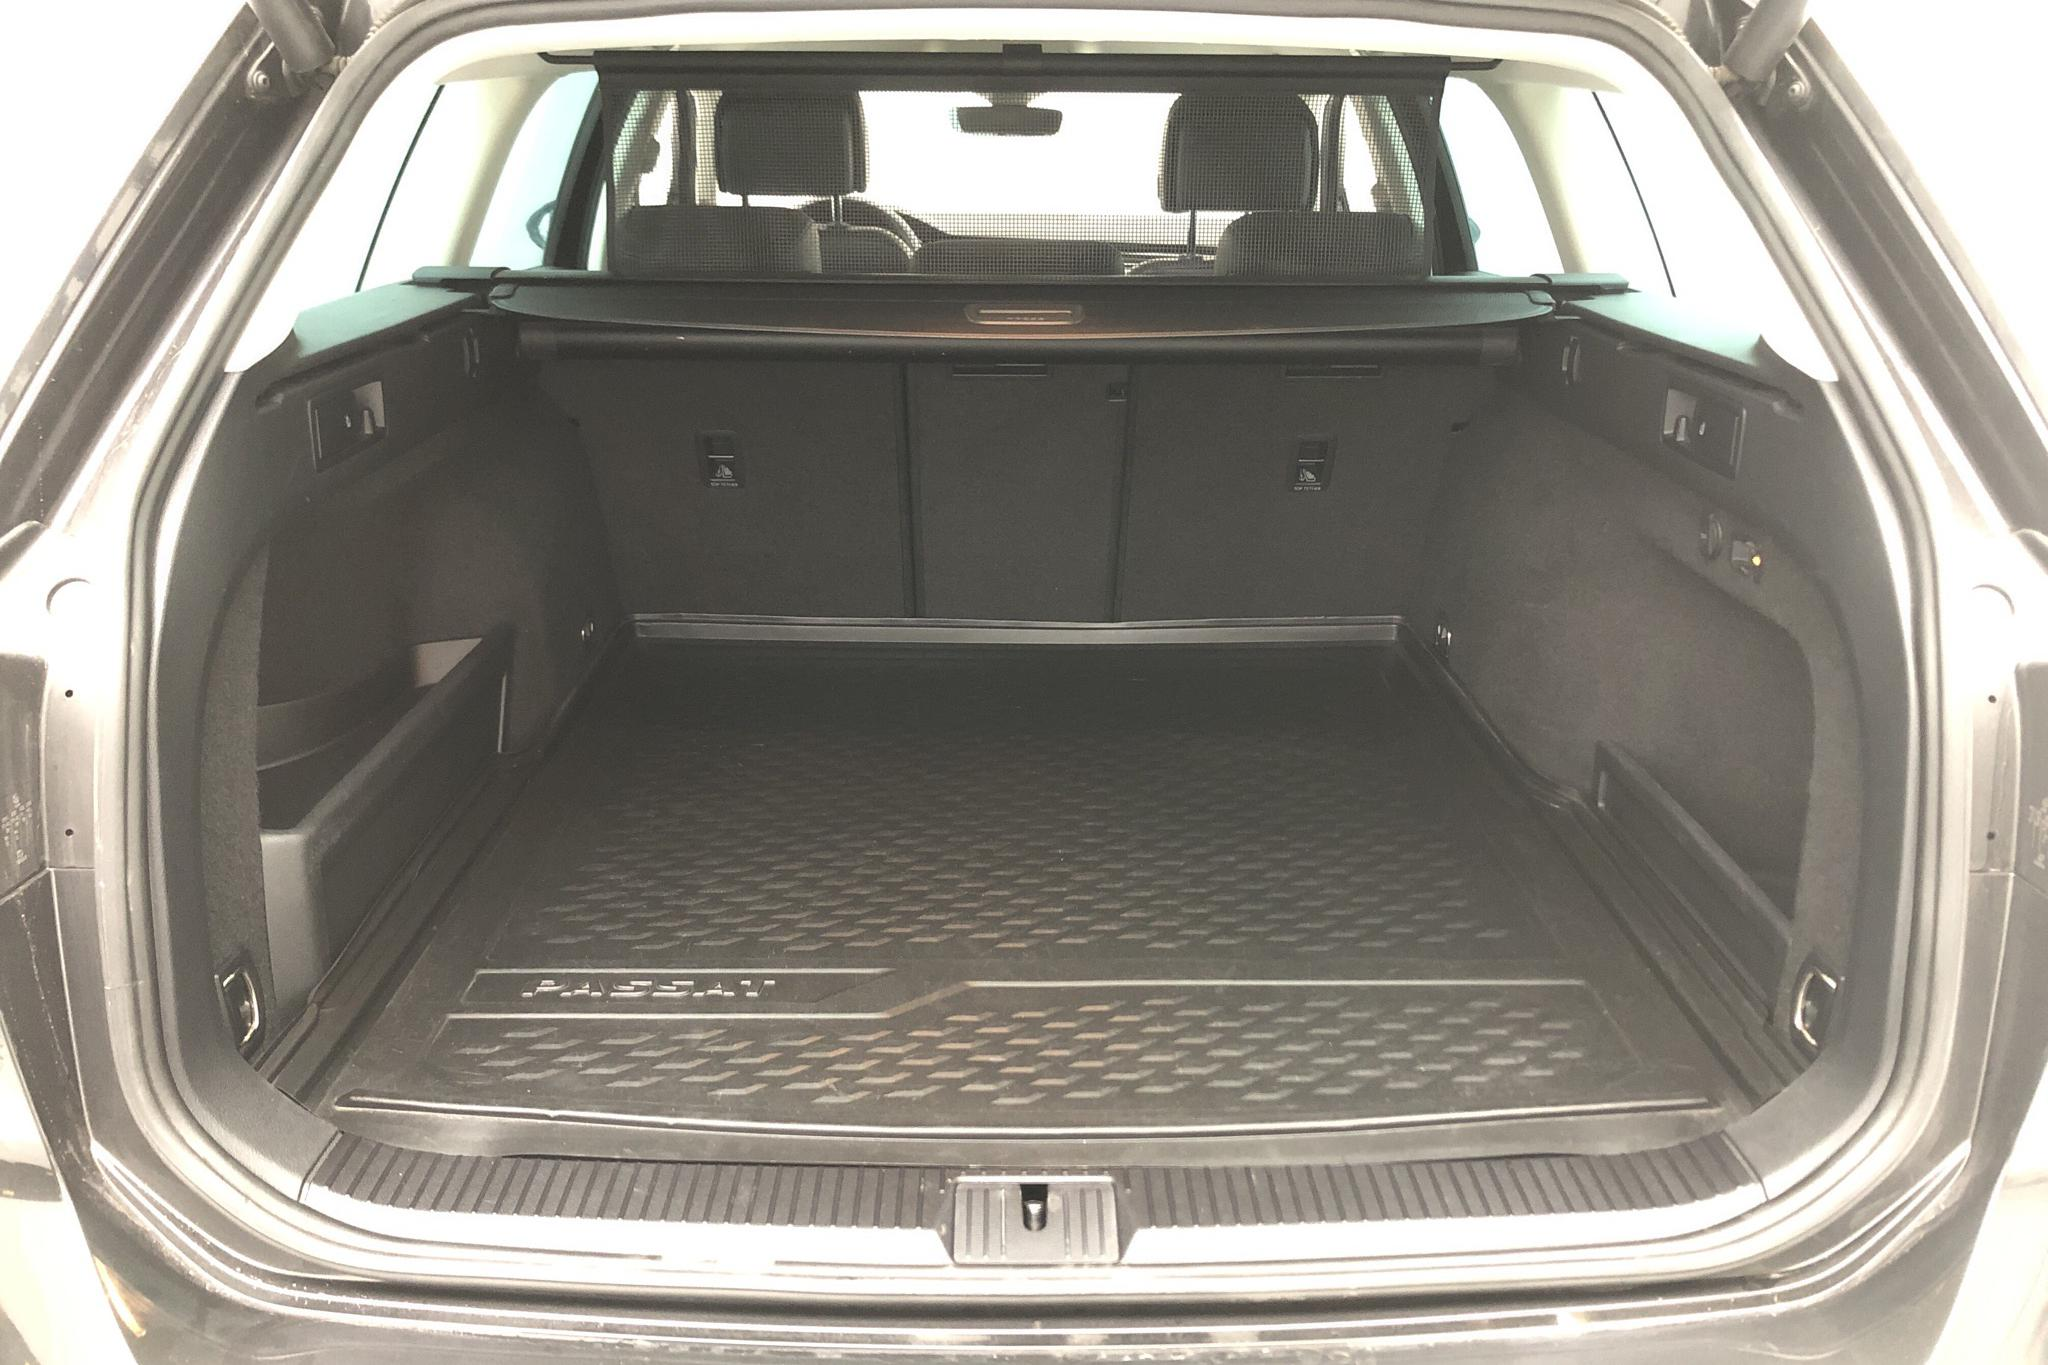 VW Passat 2.0 TDI Sportscombi 4MOTION (190hk) - 54 360 km - Automatic - Dark Grey - 2018